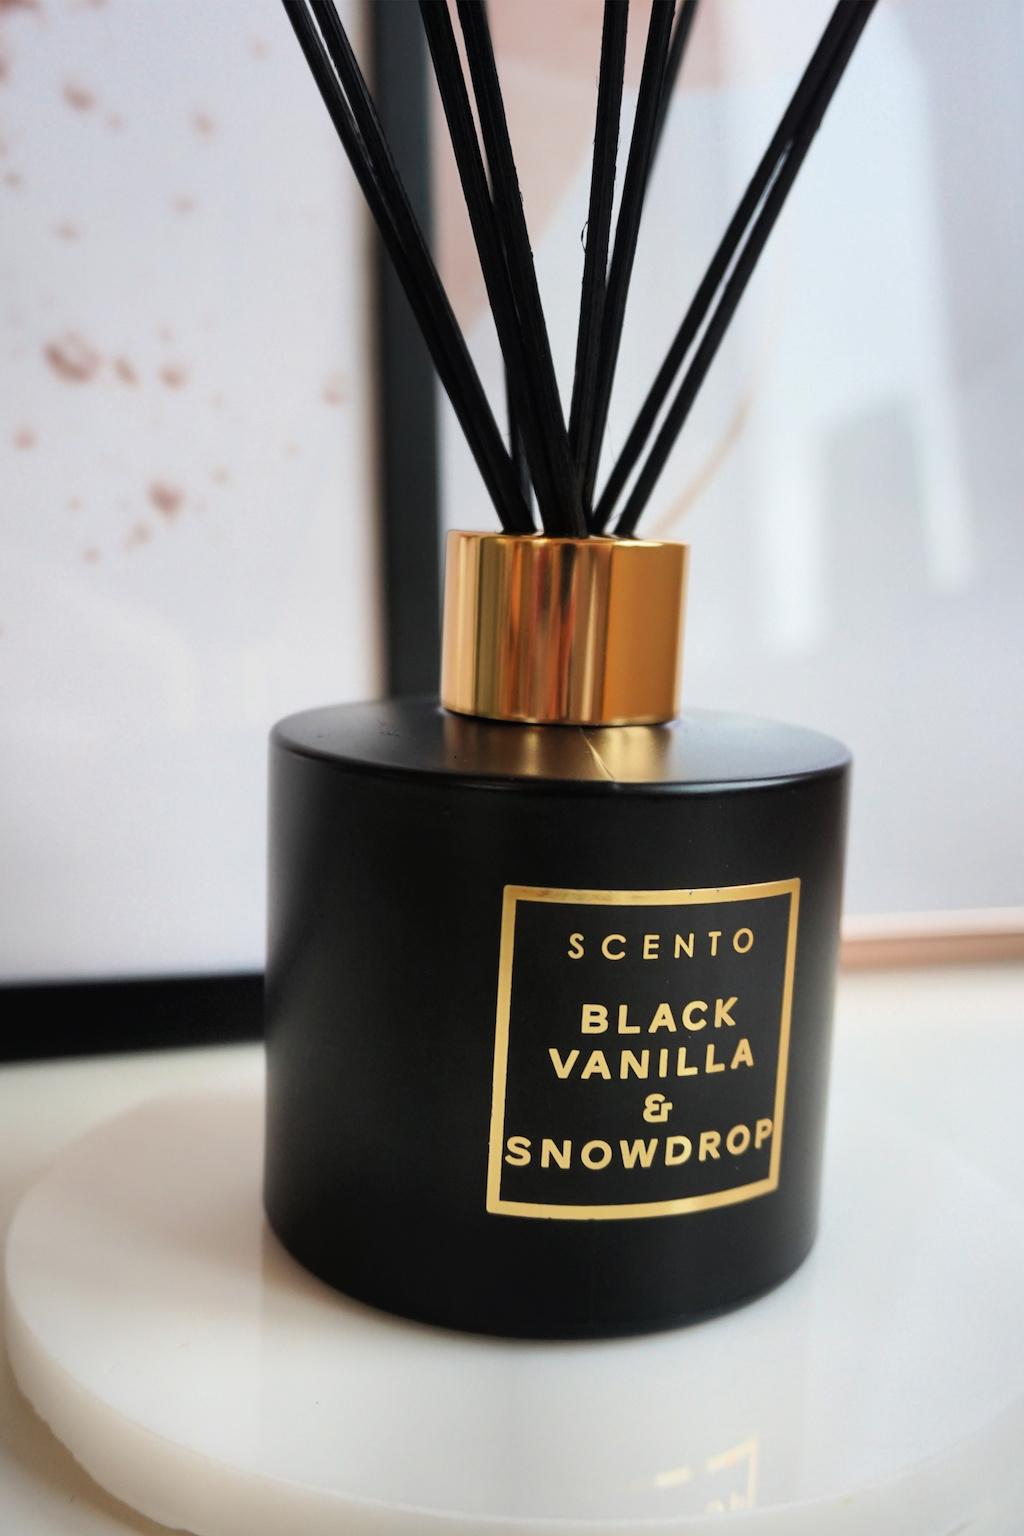 Scento Black Vanilla & Snowdrop Geurstokjes Review